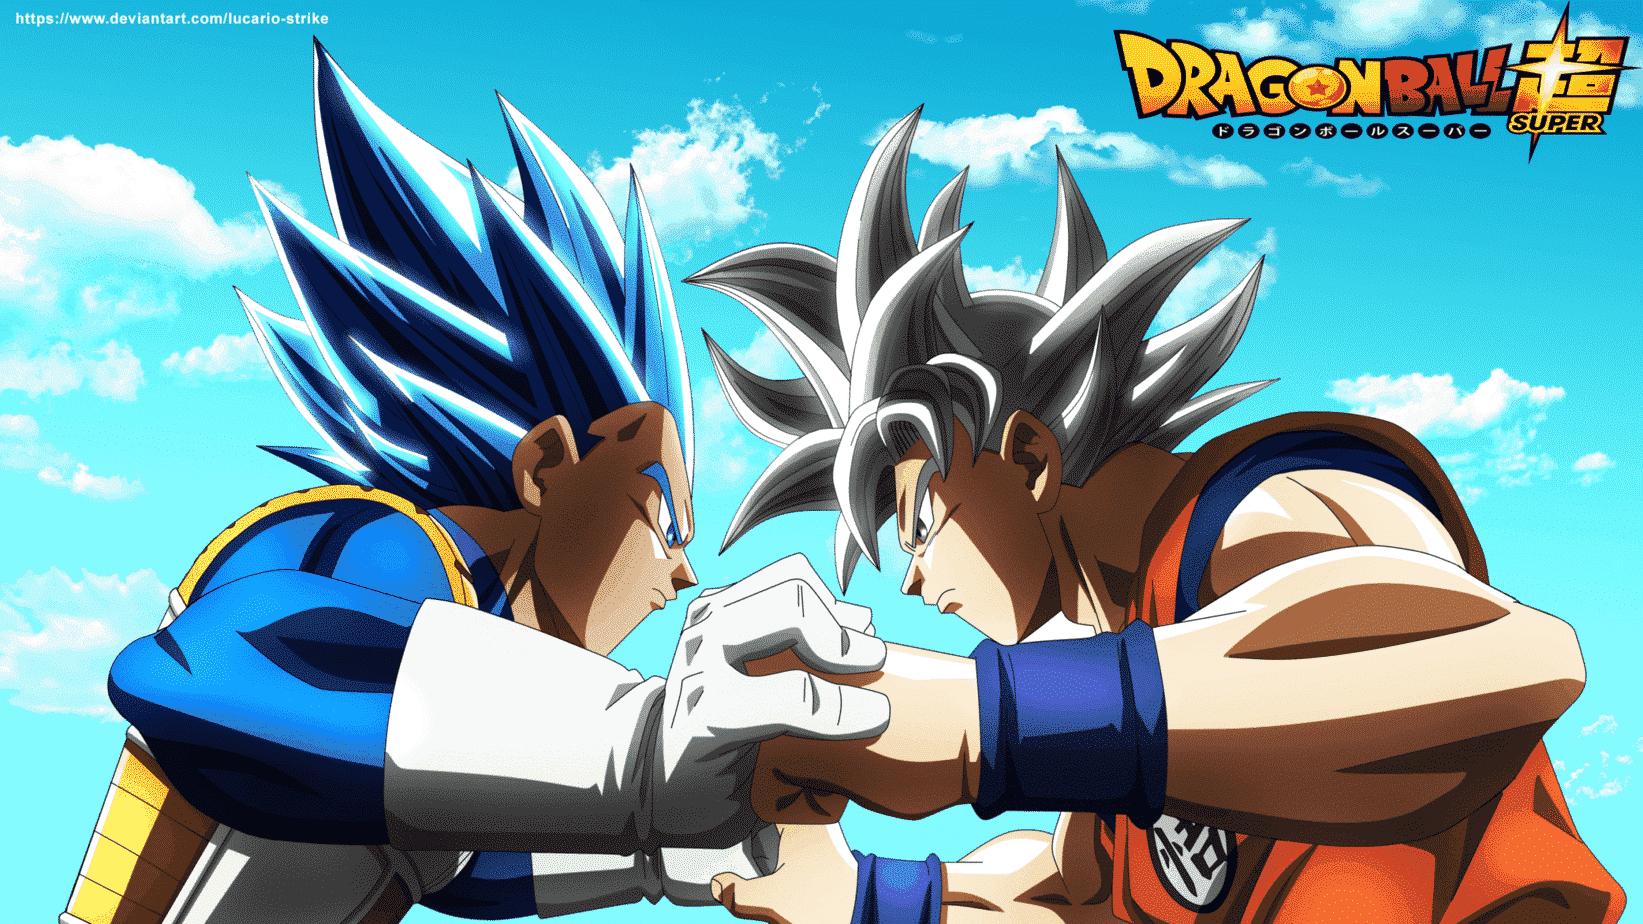 Dragon Ball Super Chapitre 67 Comment Vegeta va-t-il rattraper le pouvoir de Goku ? 3